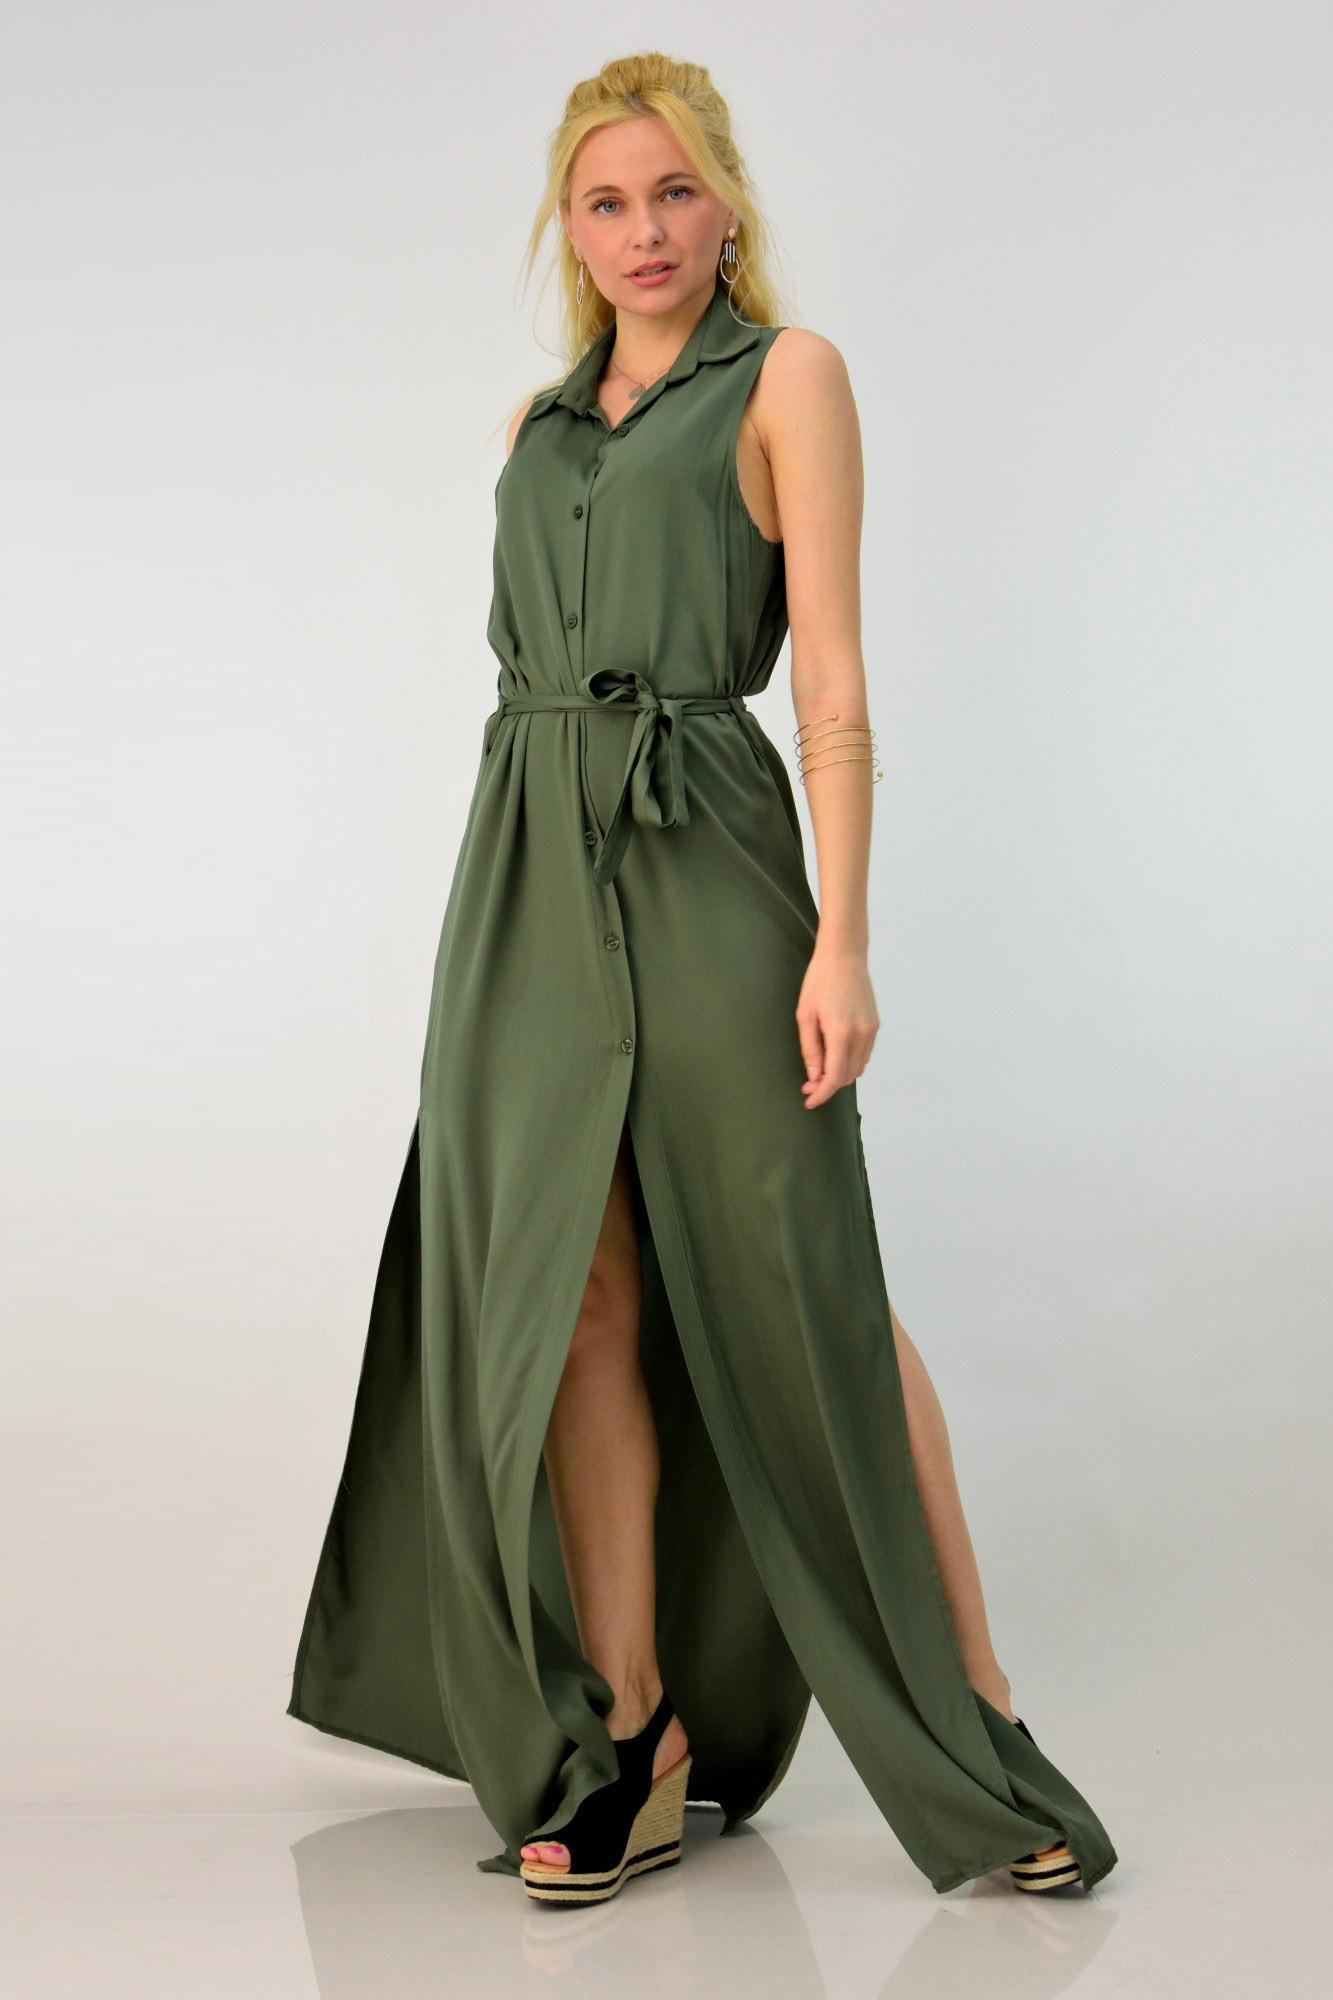 01fcd003f2cb Φόρεμα με κουμπιά και ανοίγματα. Tap to expand